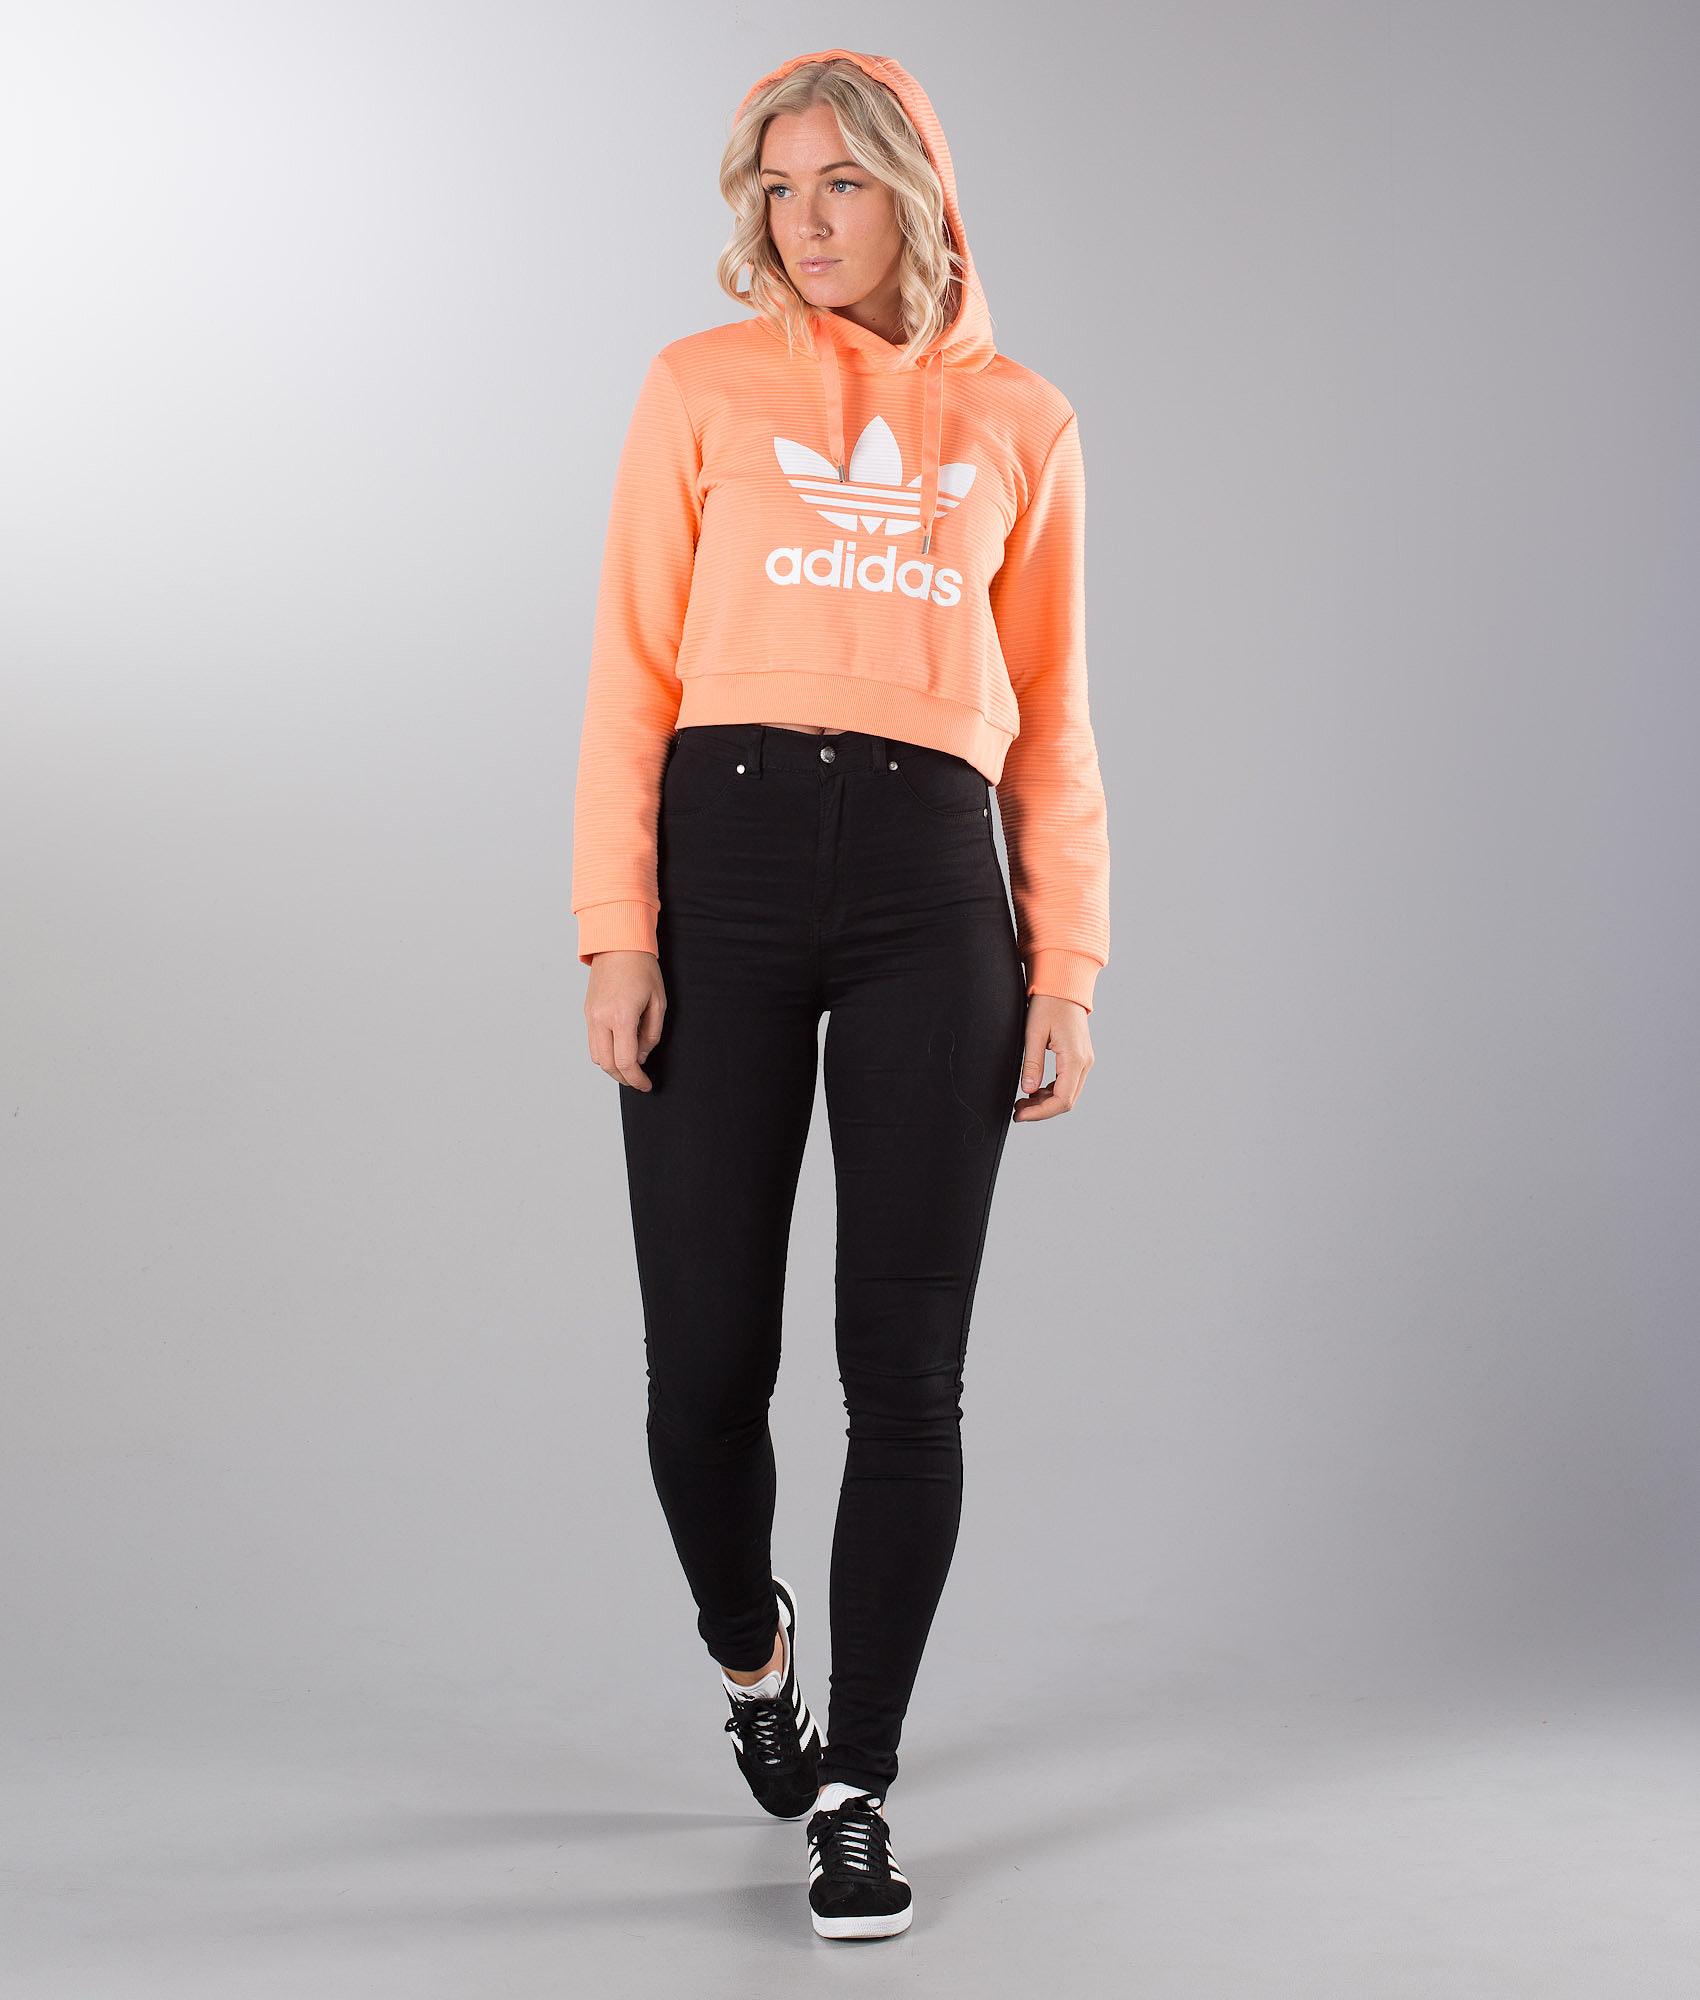 Adidas Originals Trefoil Hood Chalk Coral - Ridestore.se acdc59e256b49